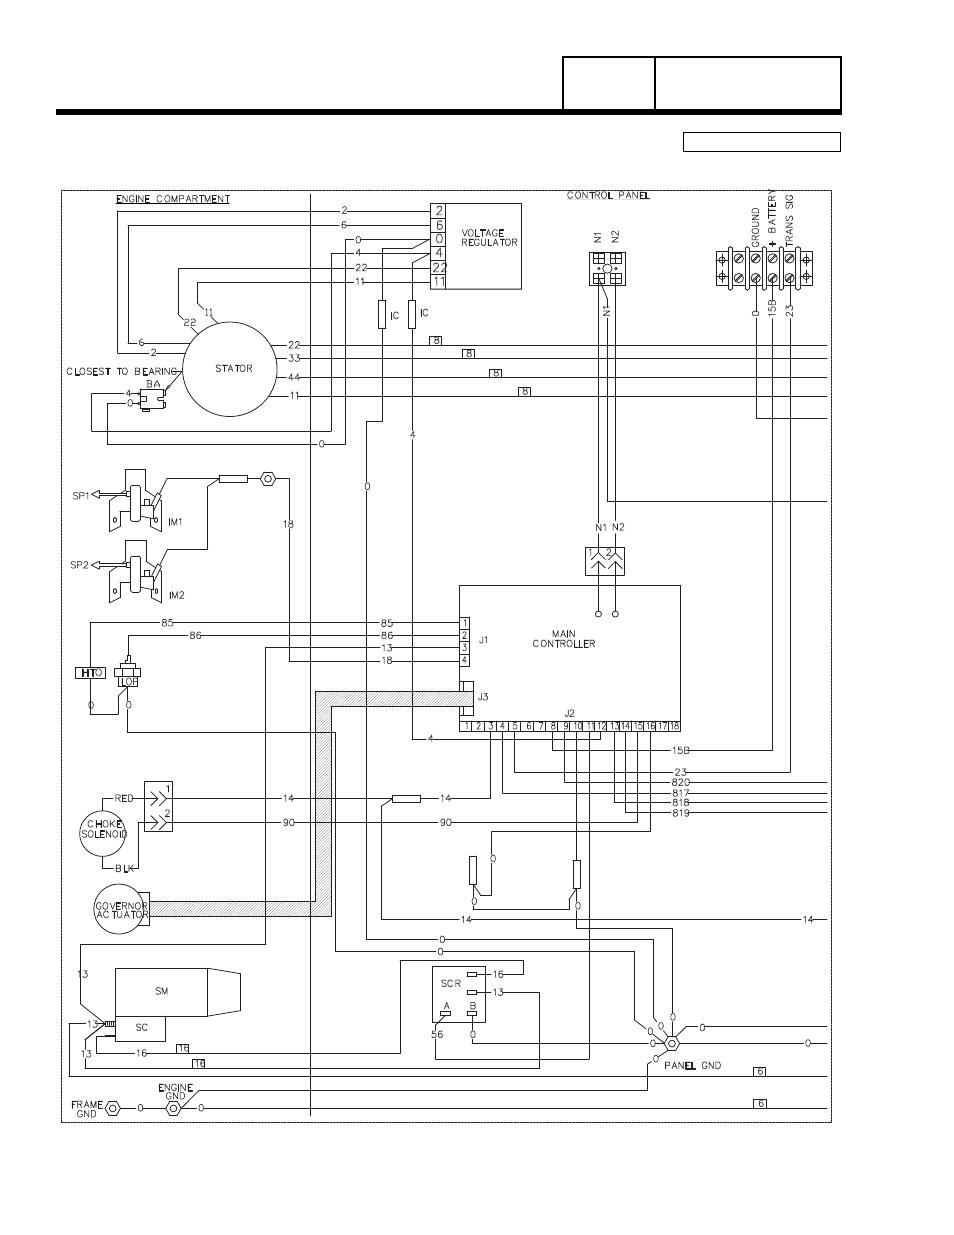 94 Accord Power Window Wiring Diagram